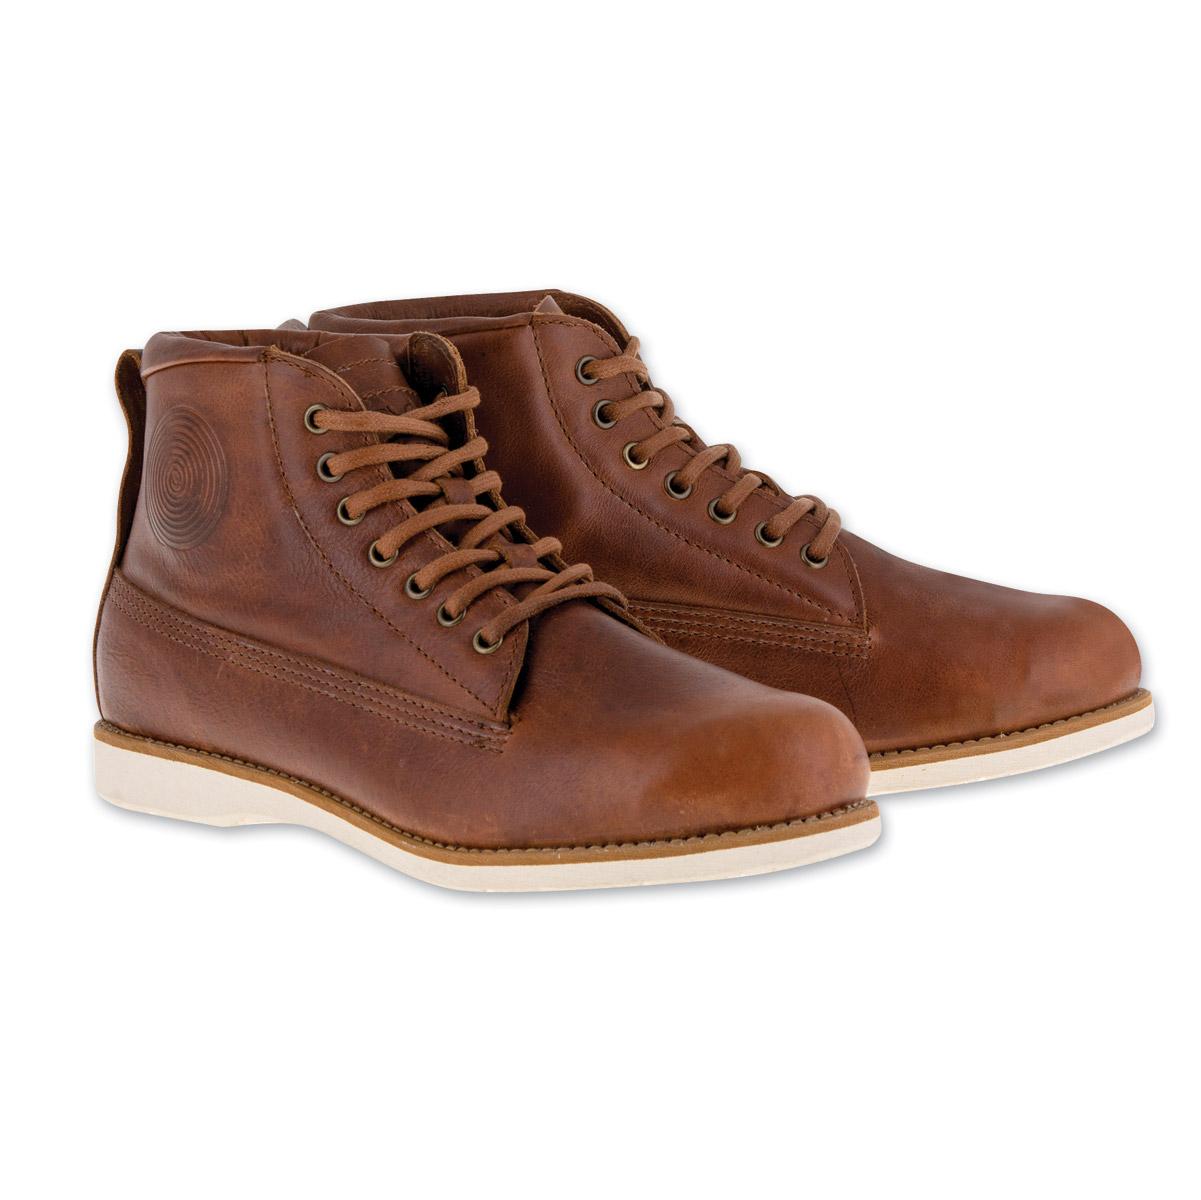 Alpinestars Oscar Men's Rayburn Brown Riding Shoes